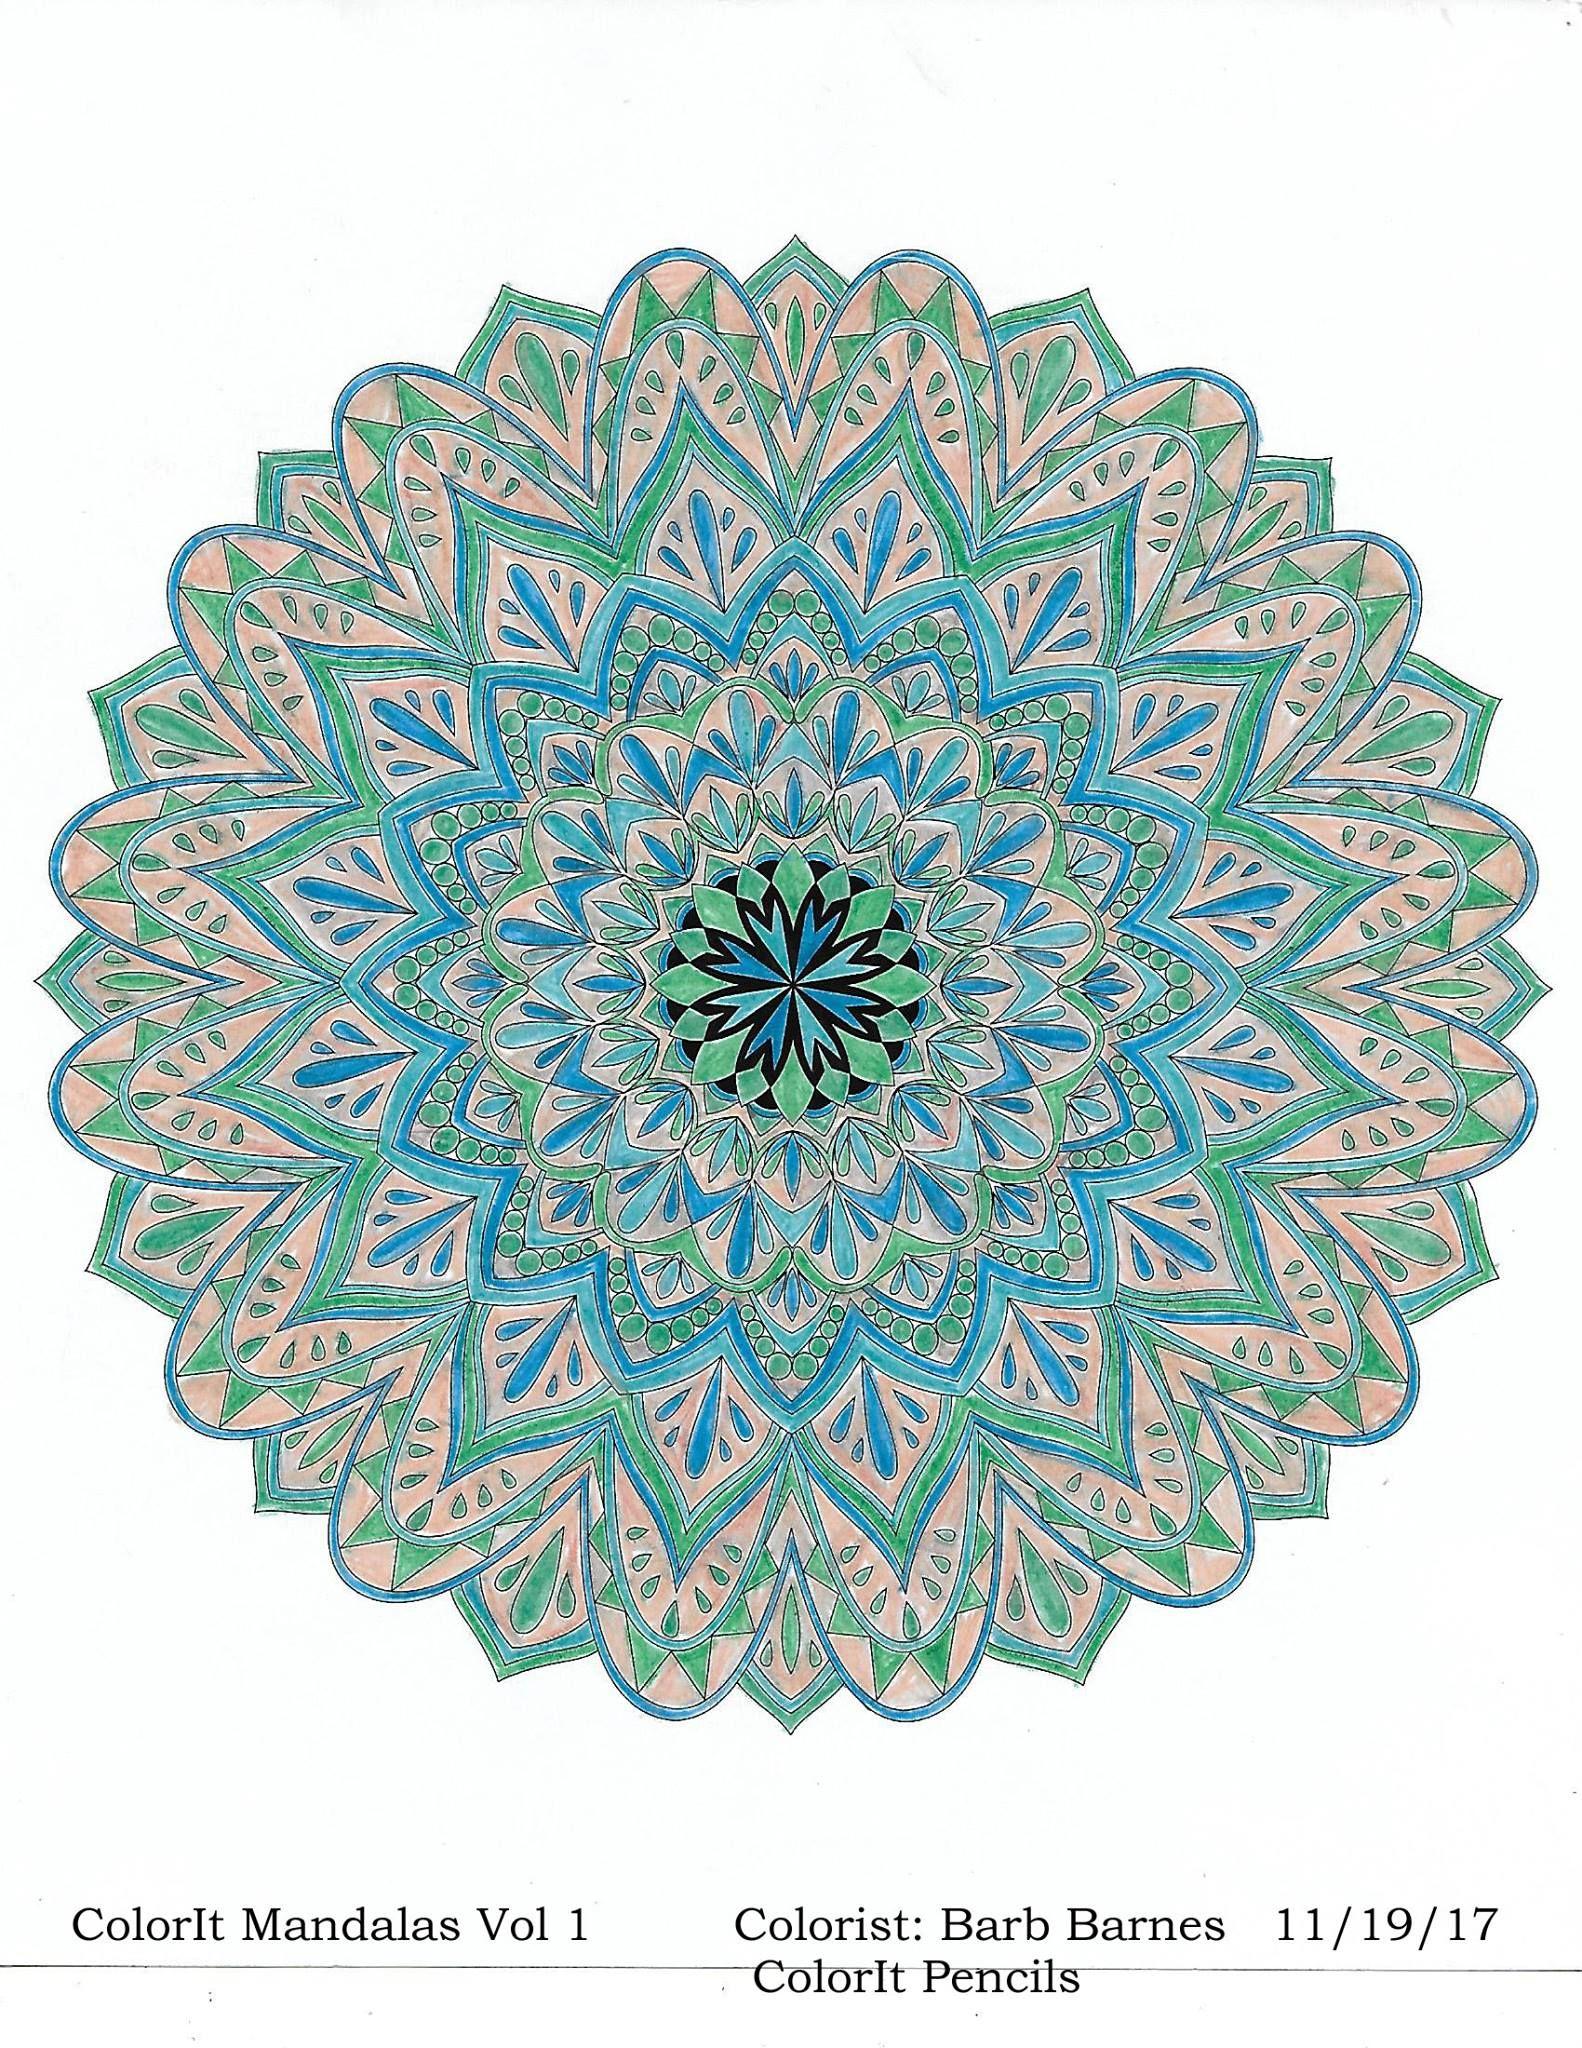 Colorit Mandalas To Color Volume 1 Colorist Barbara Barnes Adultcoloring Coloringforadults Mandalas Mandalastocolor Mandala S Tekenen